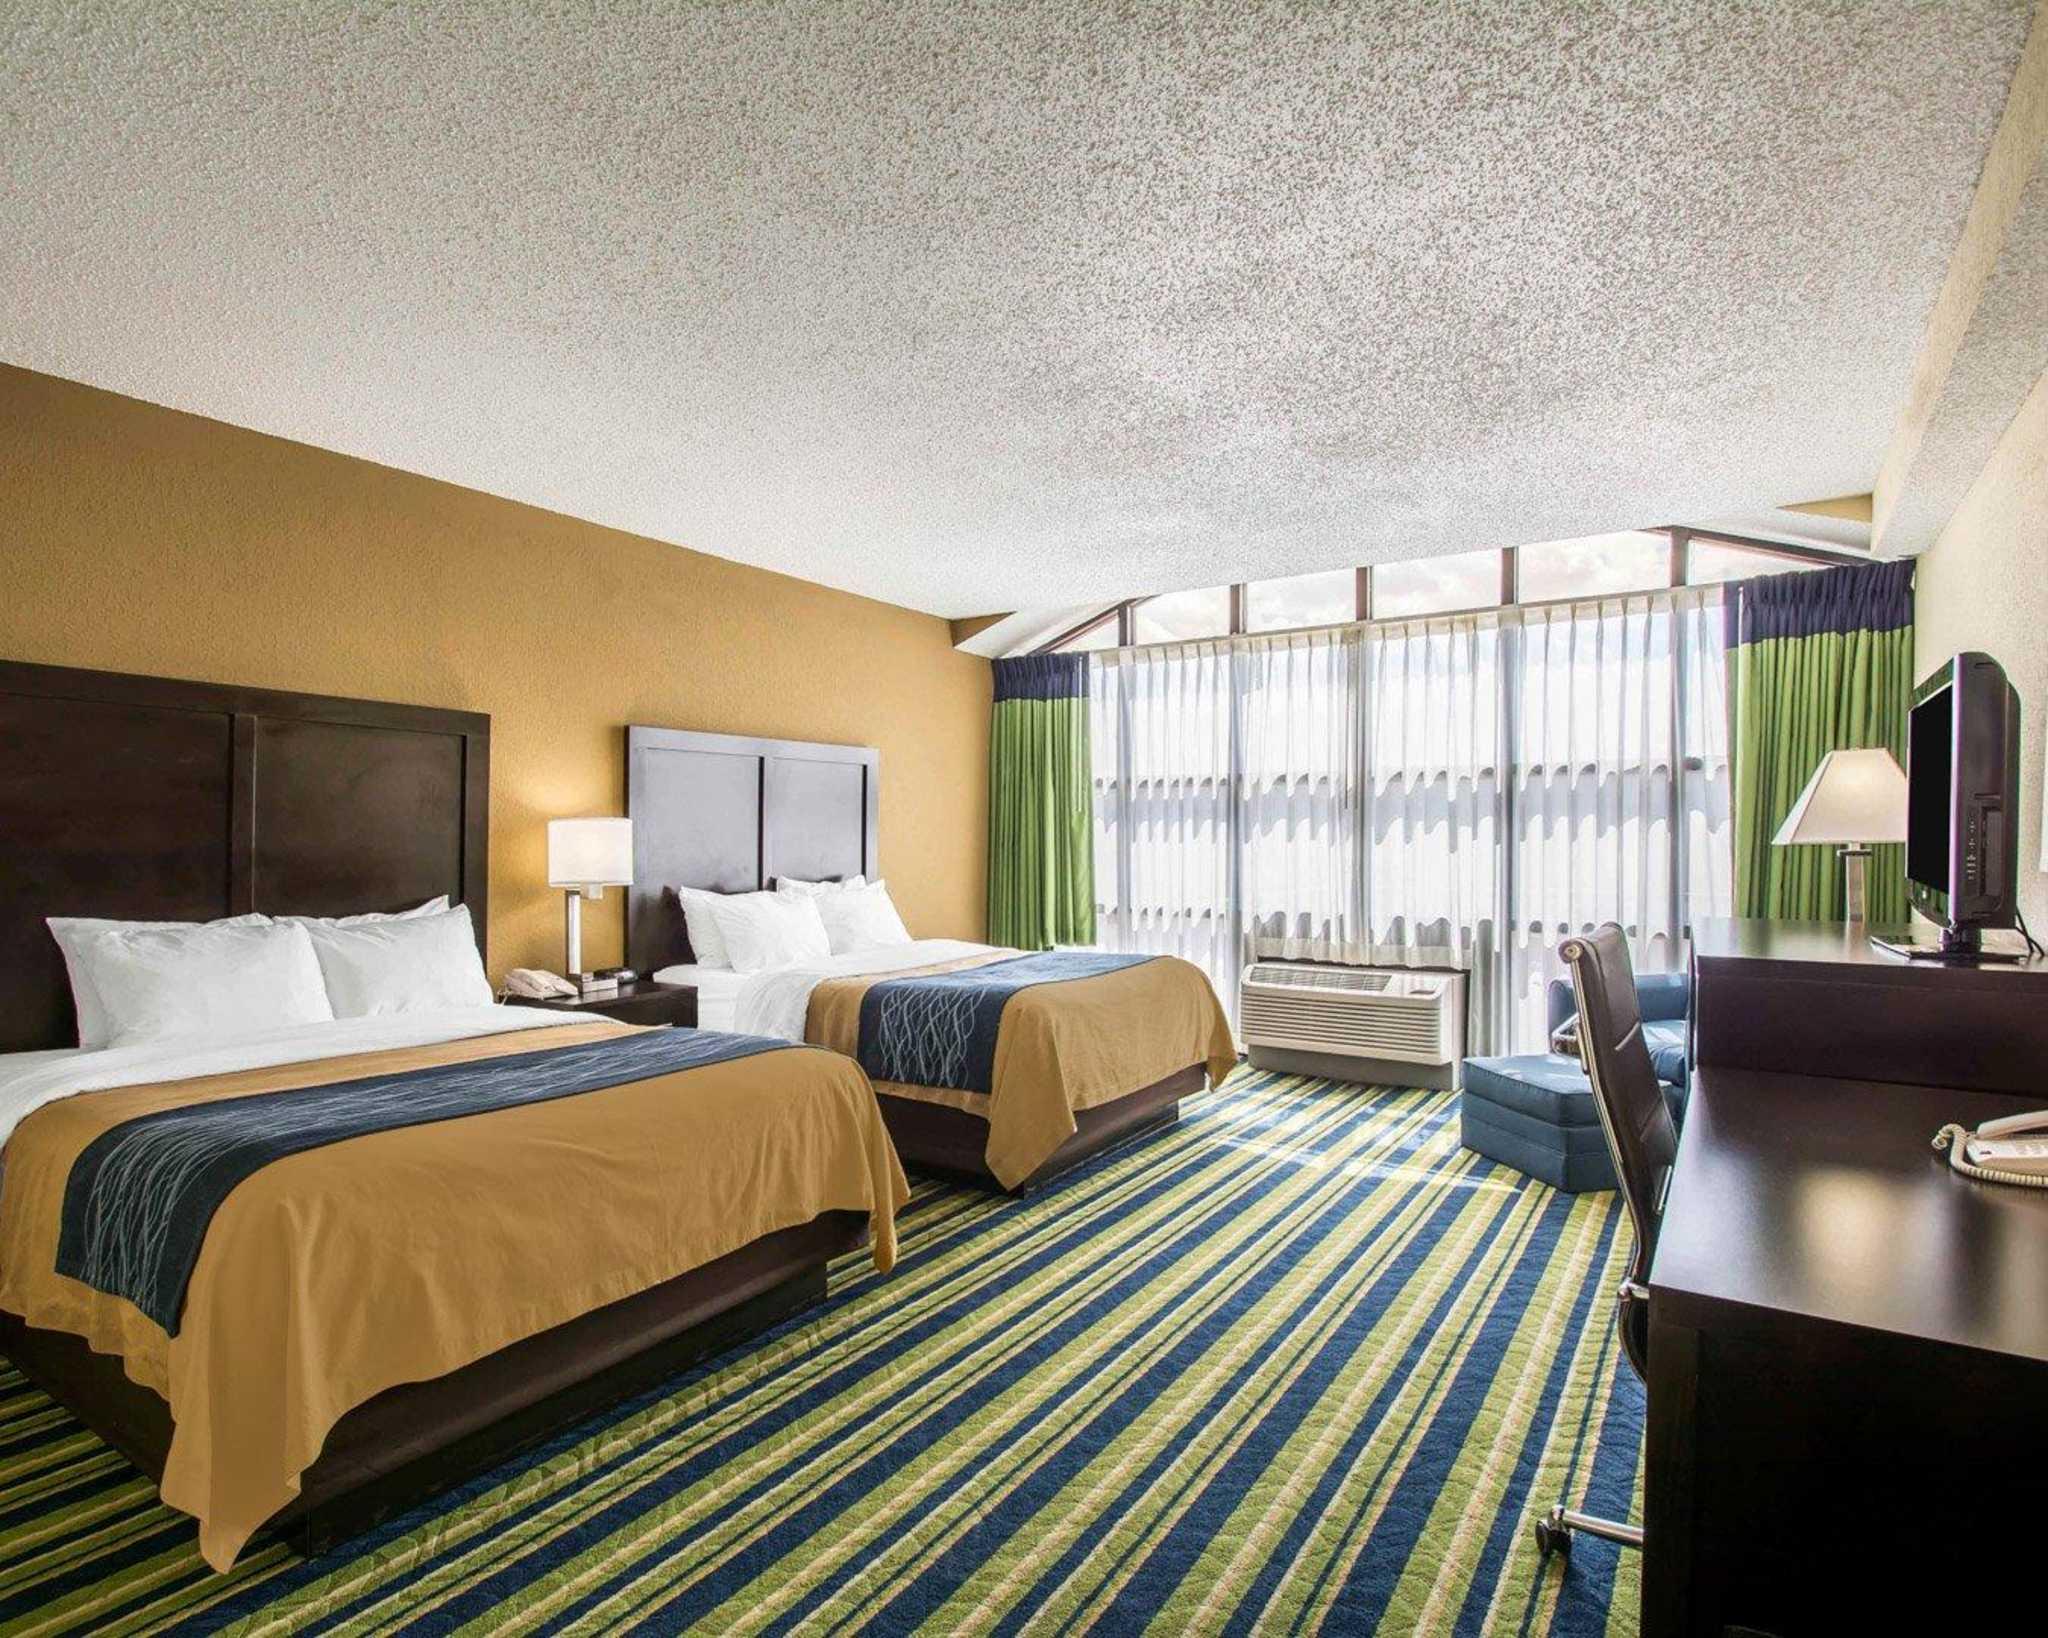 Comfort Inn & Suites Lantana - West Palm Beach South image 30